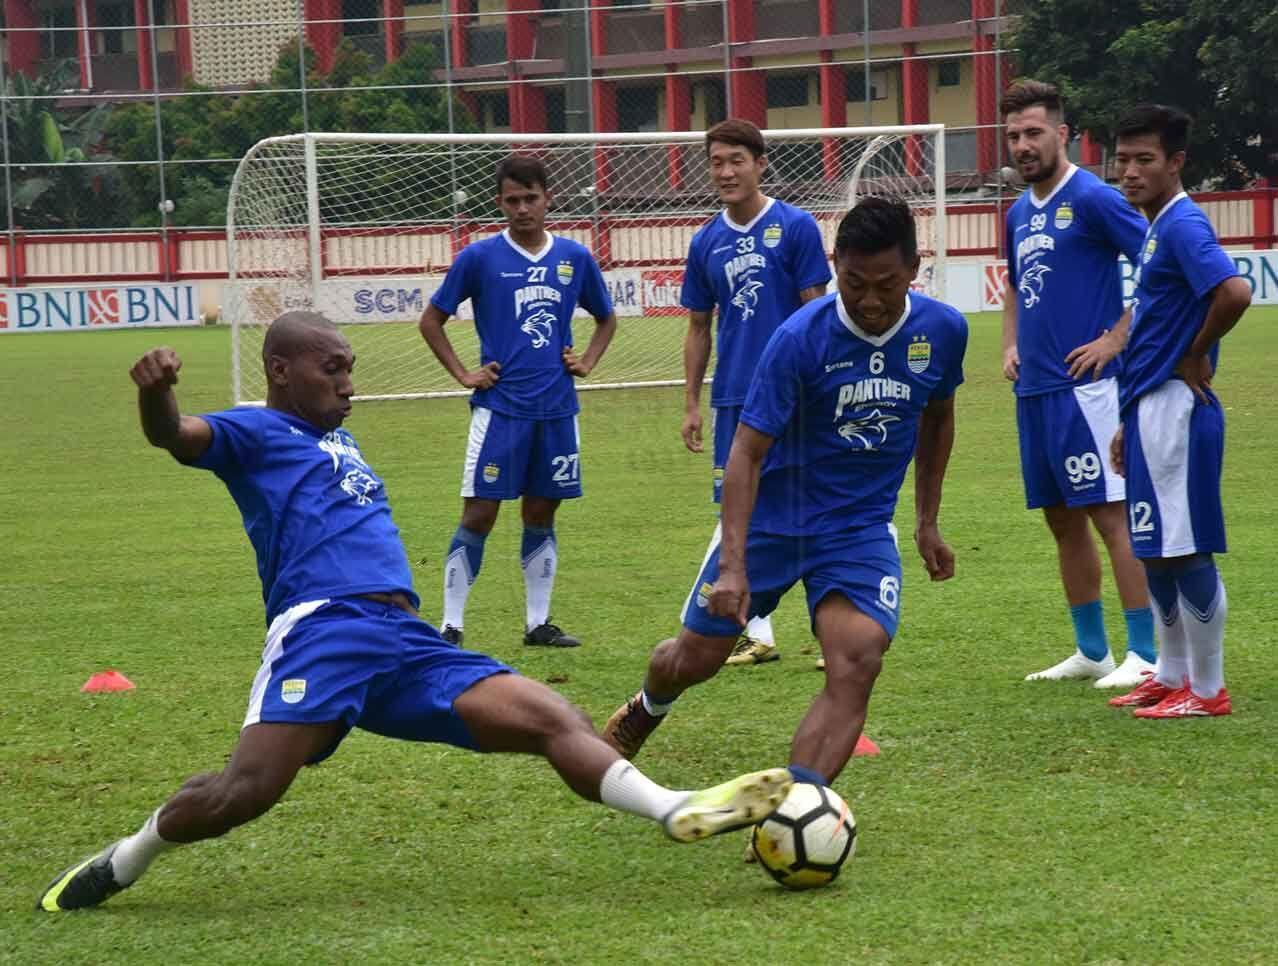 Preview Bhayangkara FC Vs Persib: Antara Rasa Optimis dan Waspada